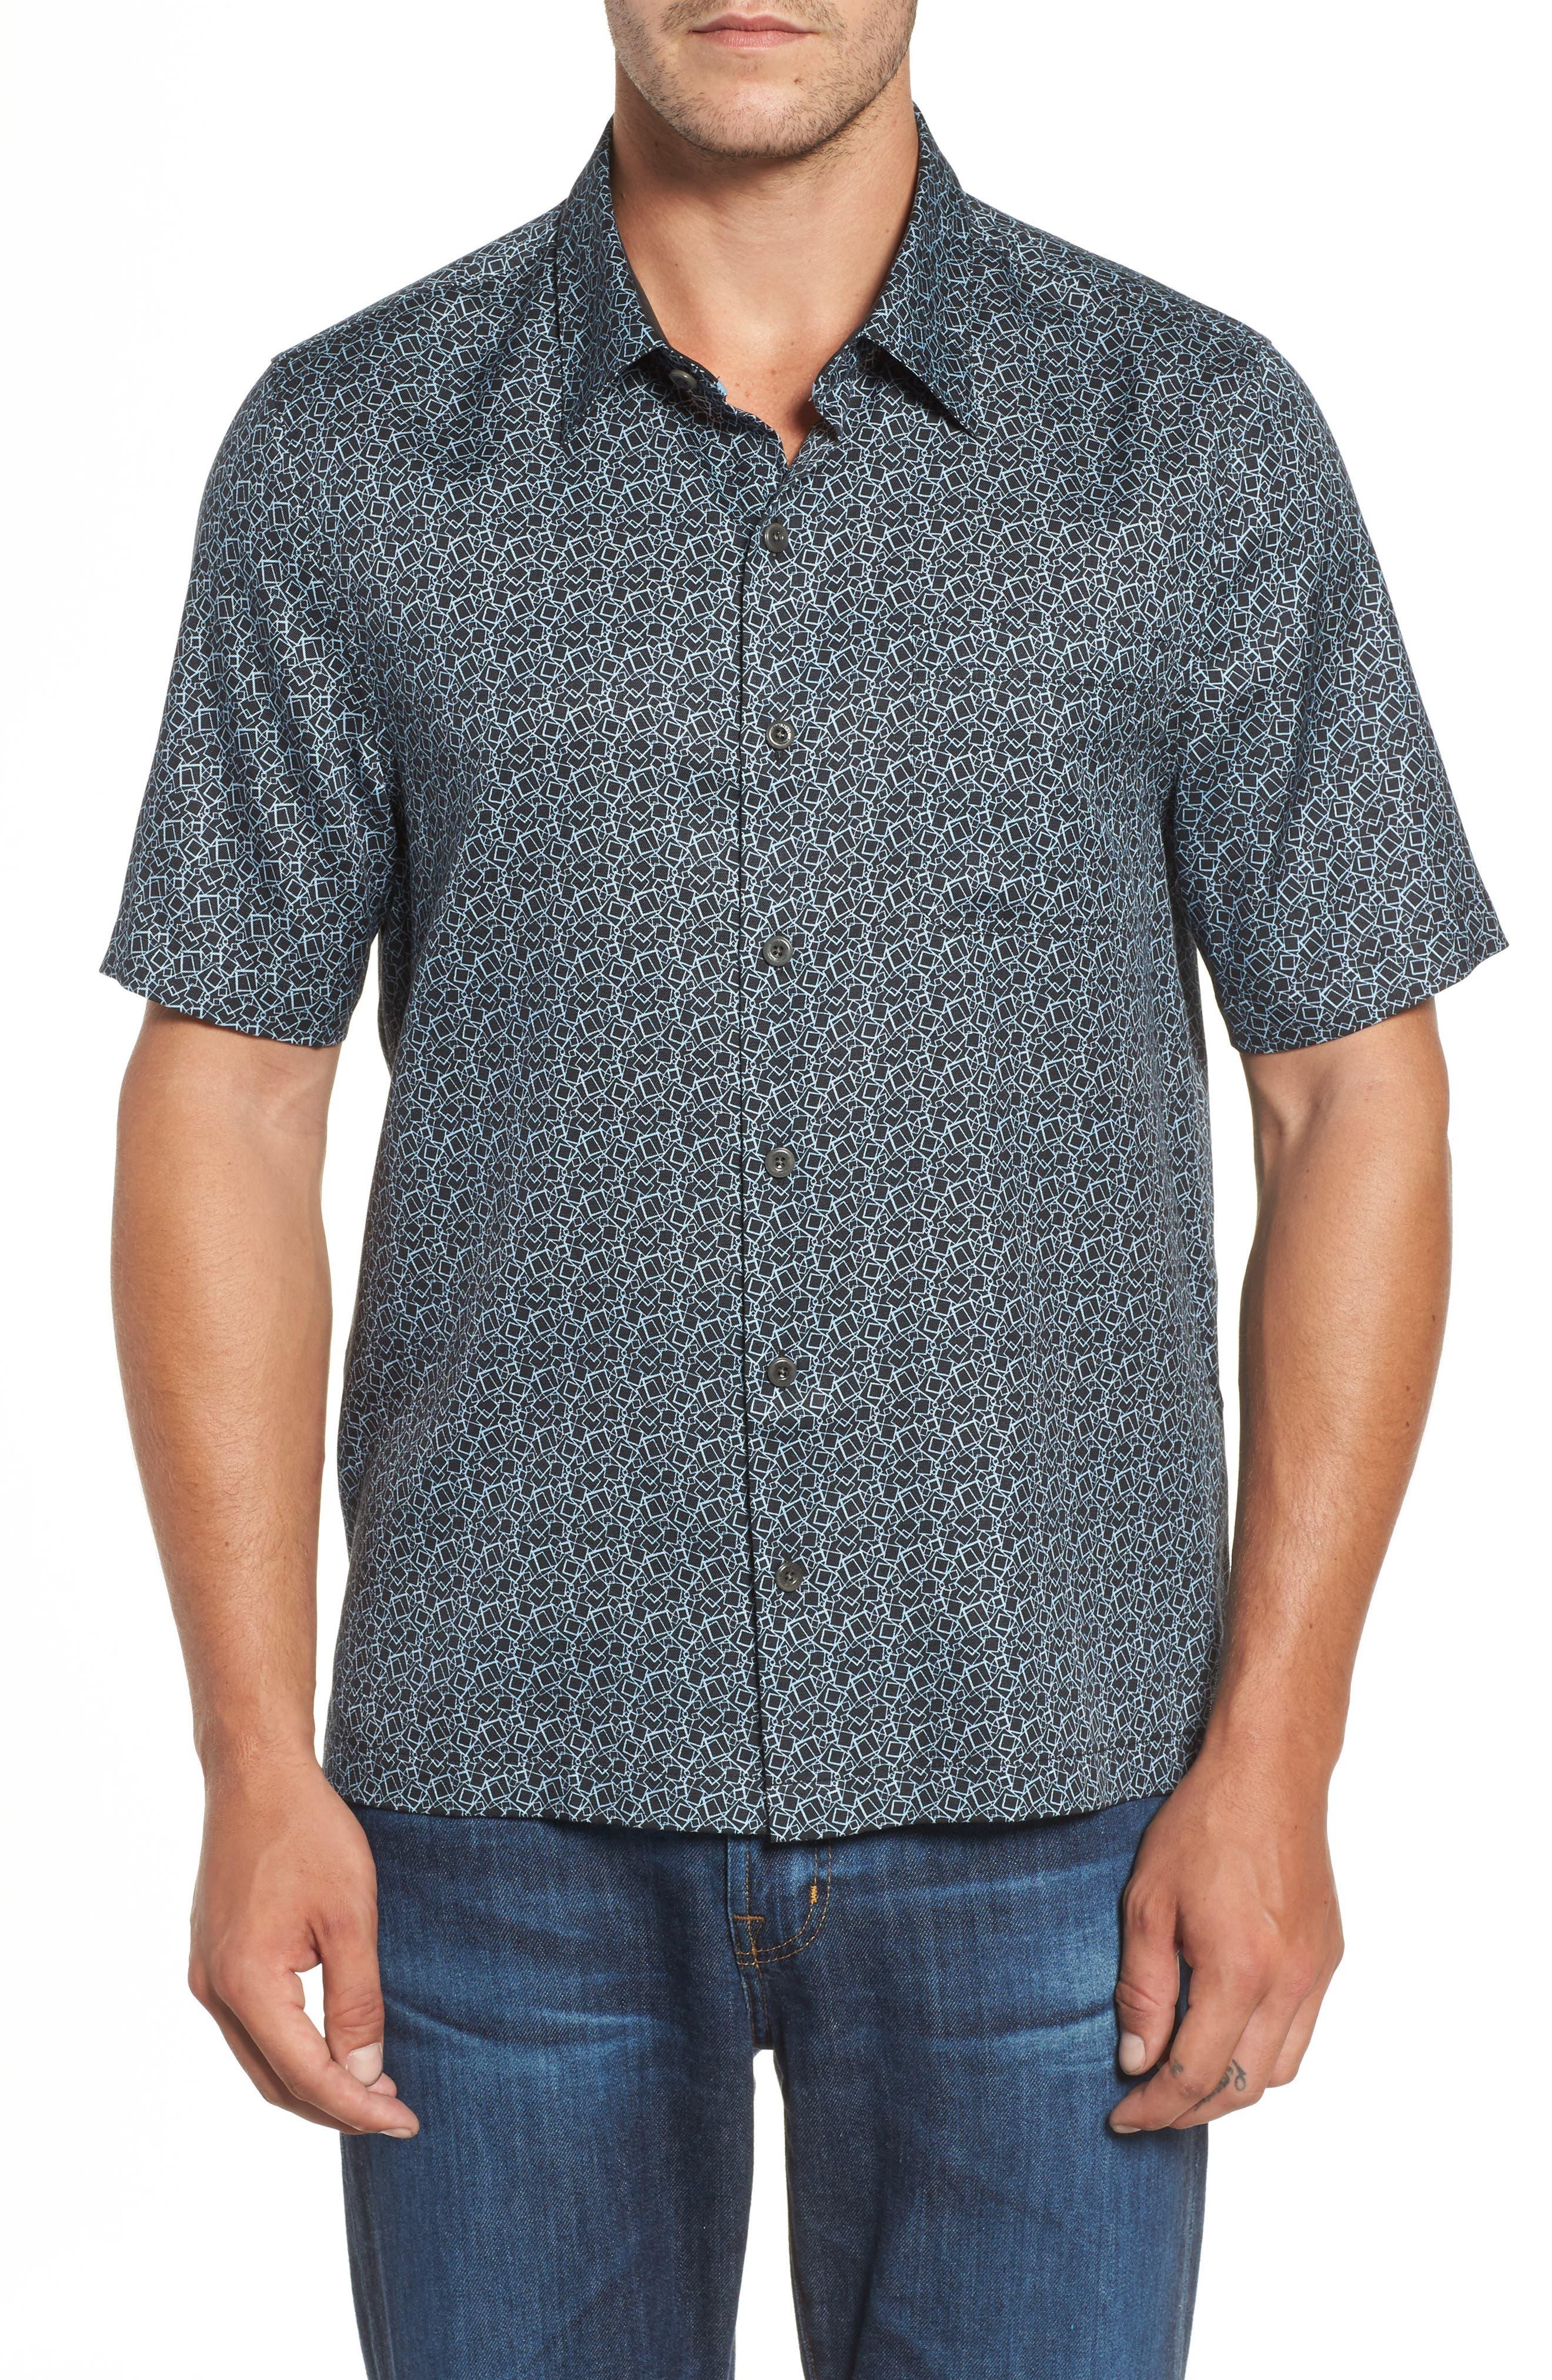 Main Image - Nat Nast Blizzard Classic Fit Silk Blend Sport Shirt